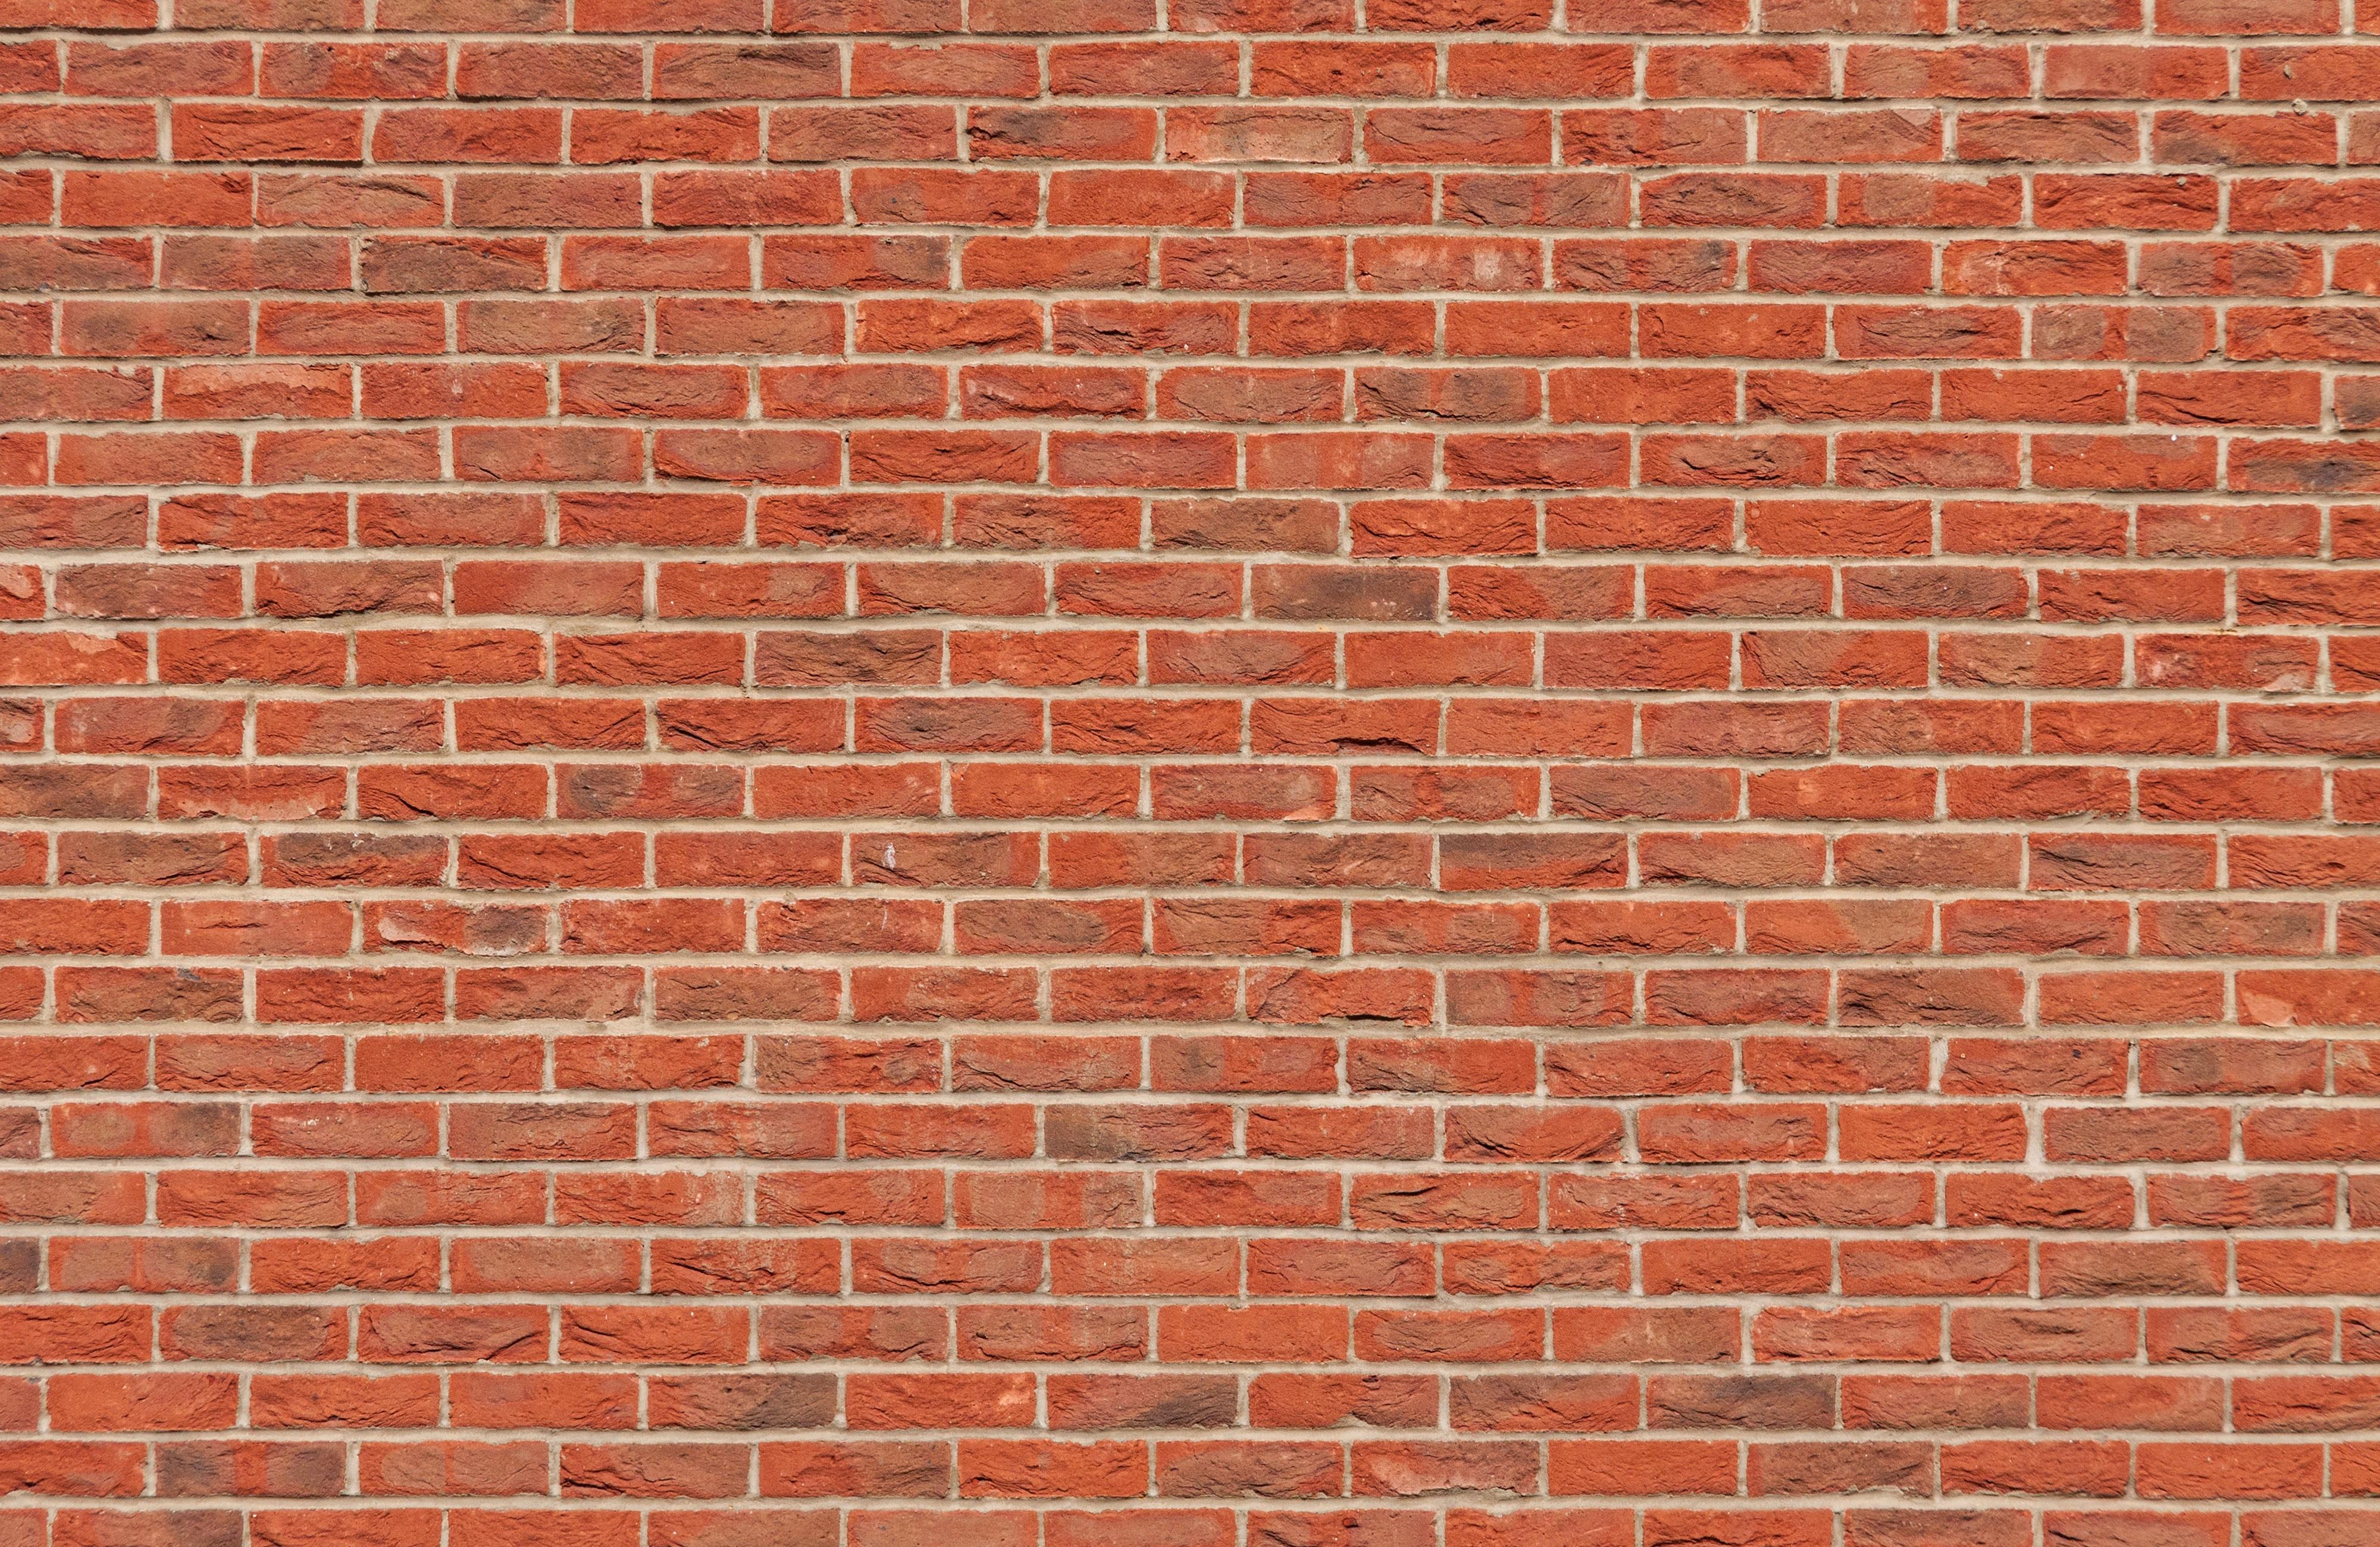 1000 Interesting Brick Texture Photos Pexels Free